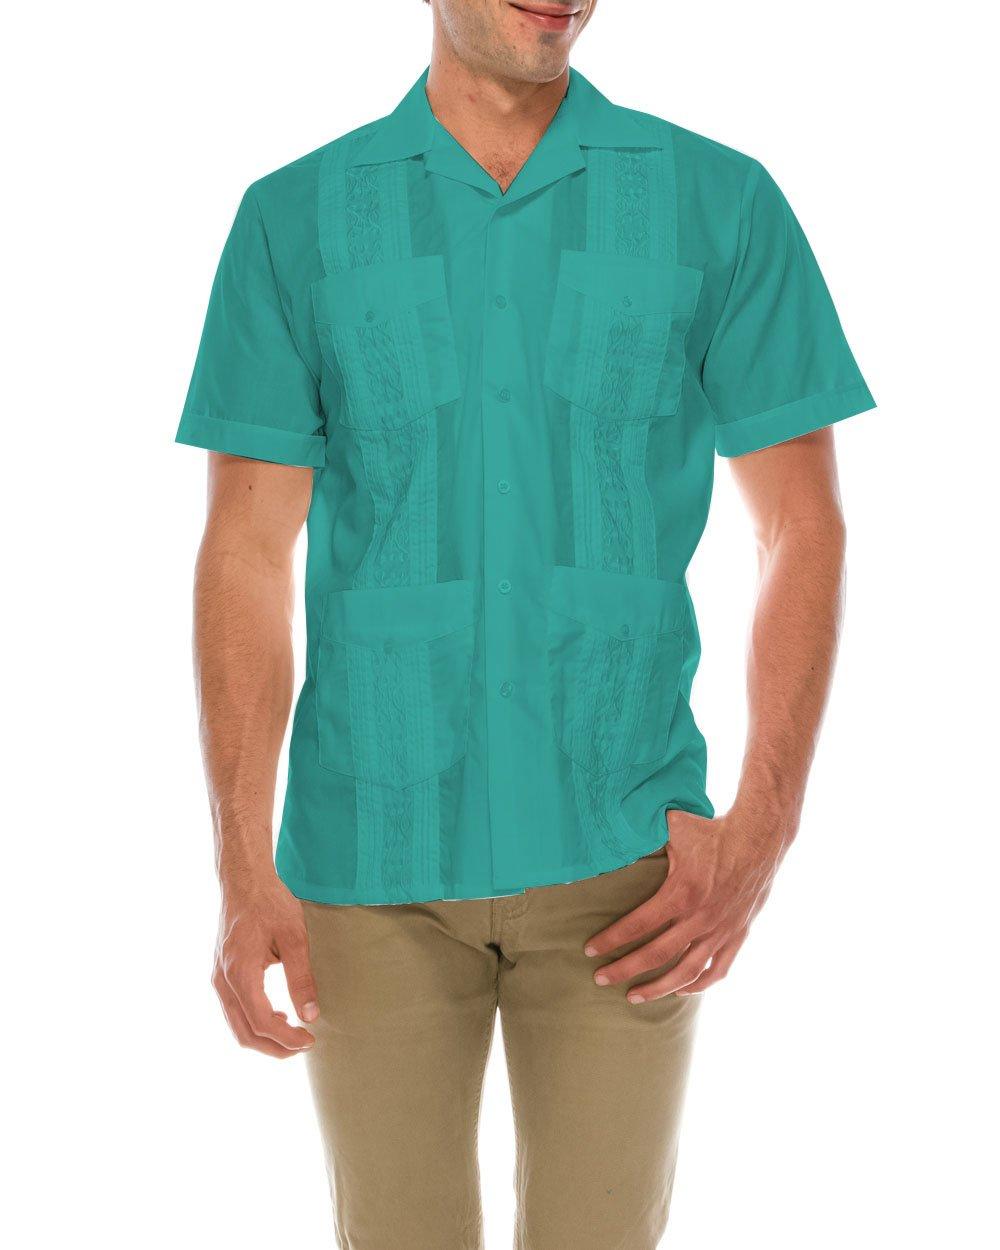 TrueM Men's Short Sleeve Cuban Guayabera Shirts (4XL, Turq)